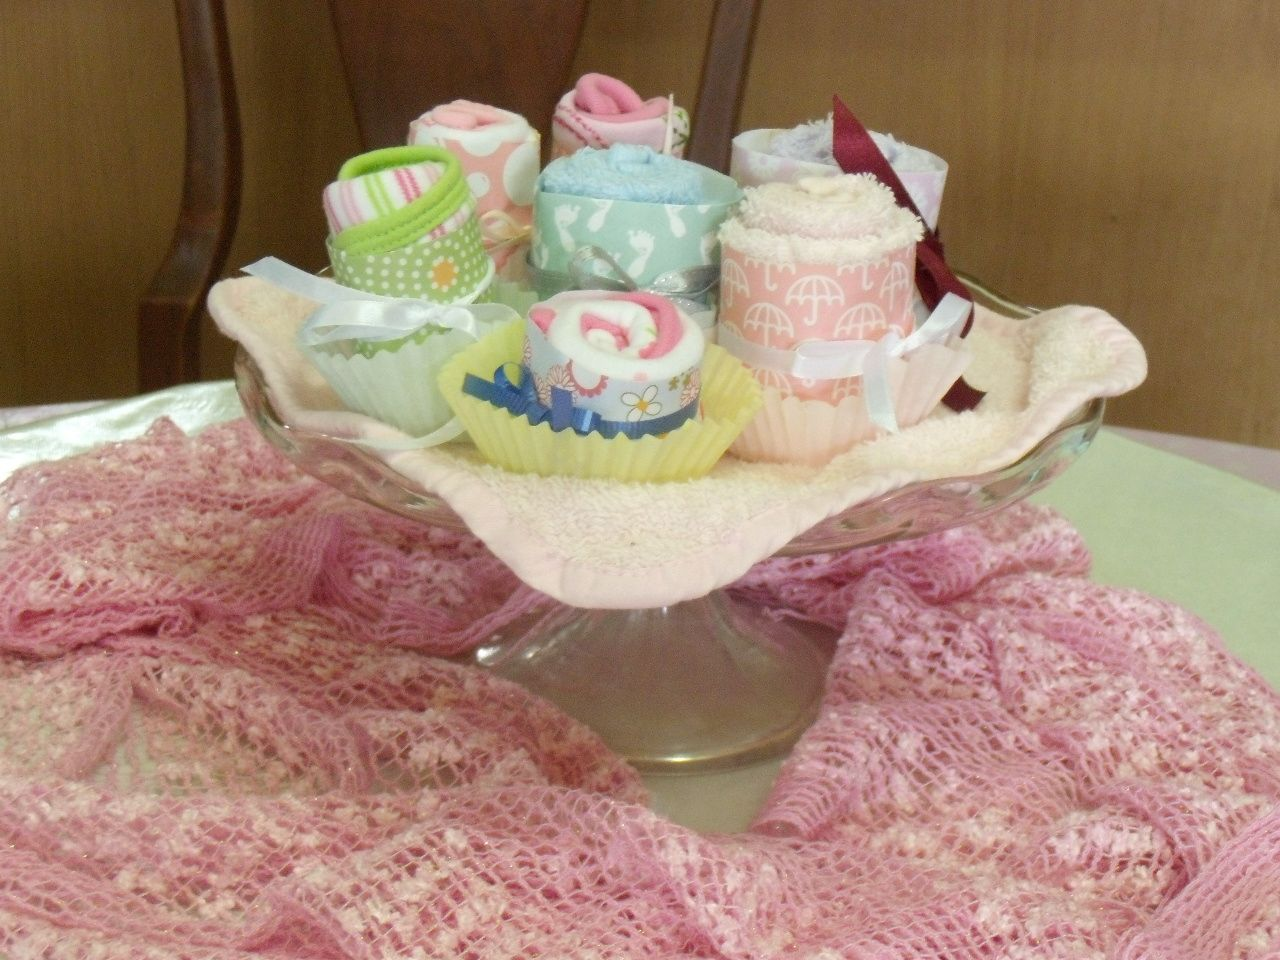 Bib and baby towel cupcakes.  So easy to make using scrapbook paper, ribbons and cupcake liner!